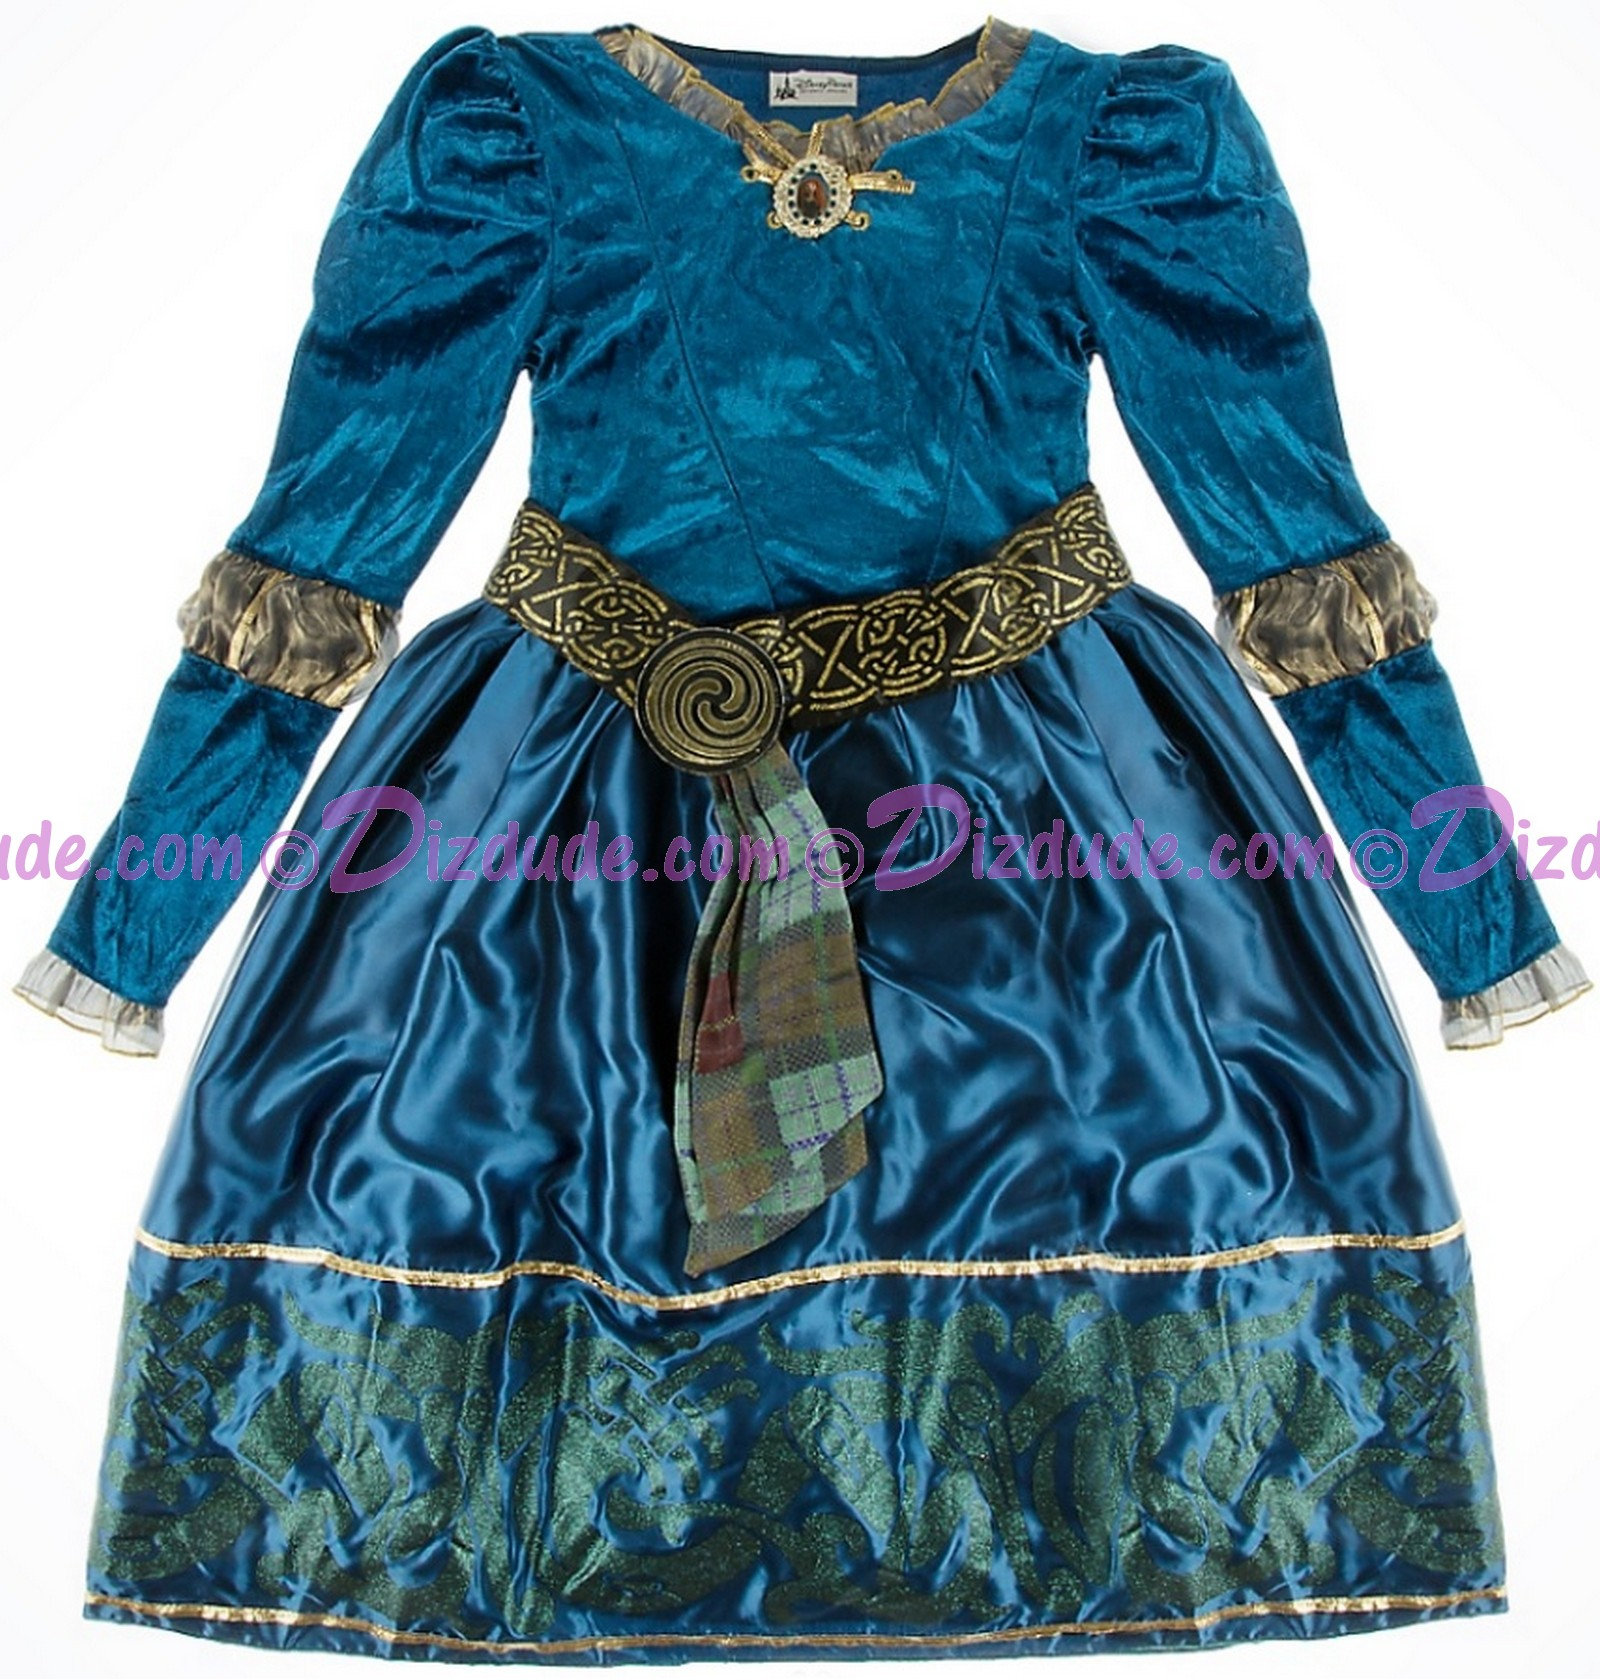 BRAVE Princess Merida's Hero Dress